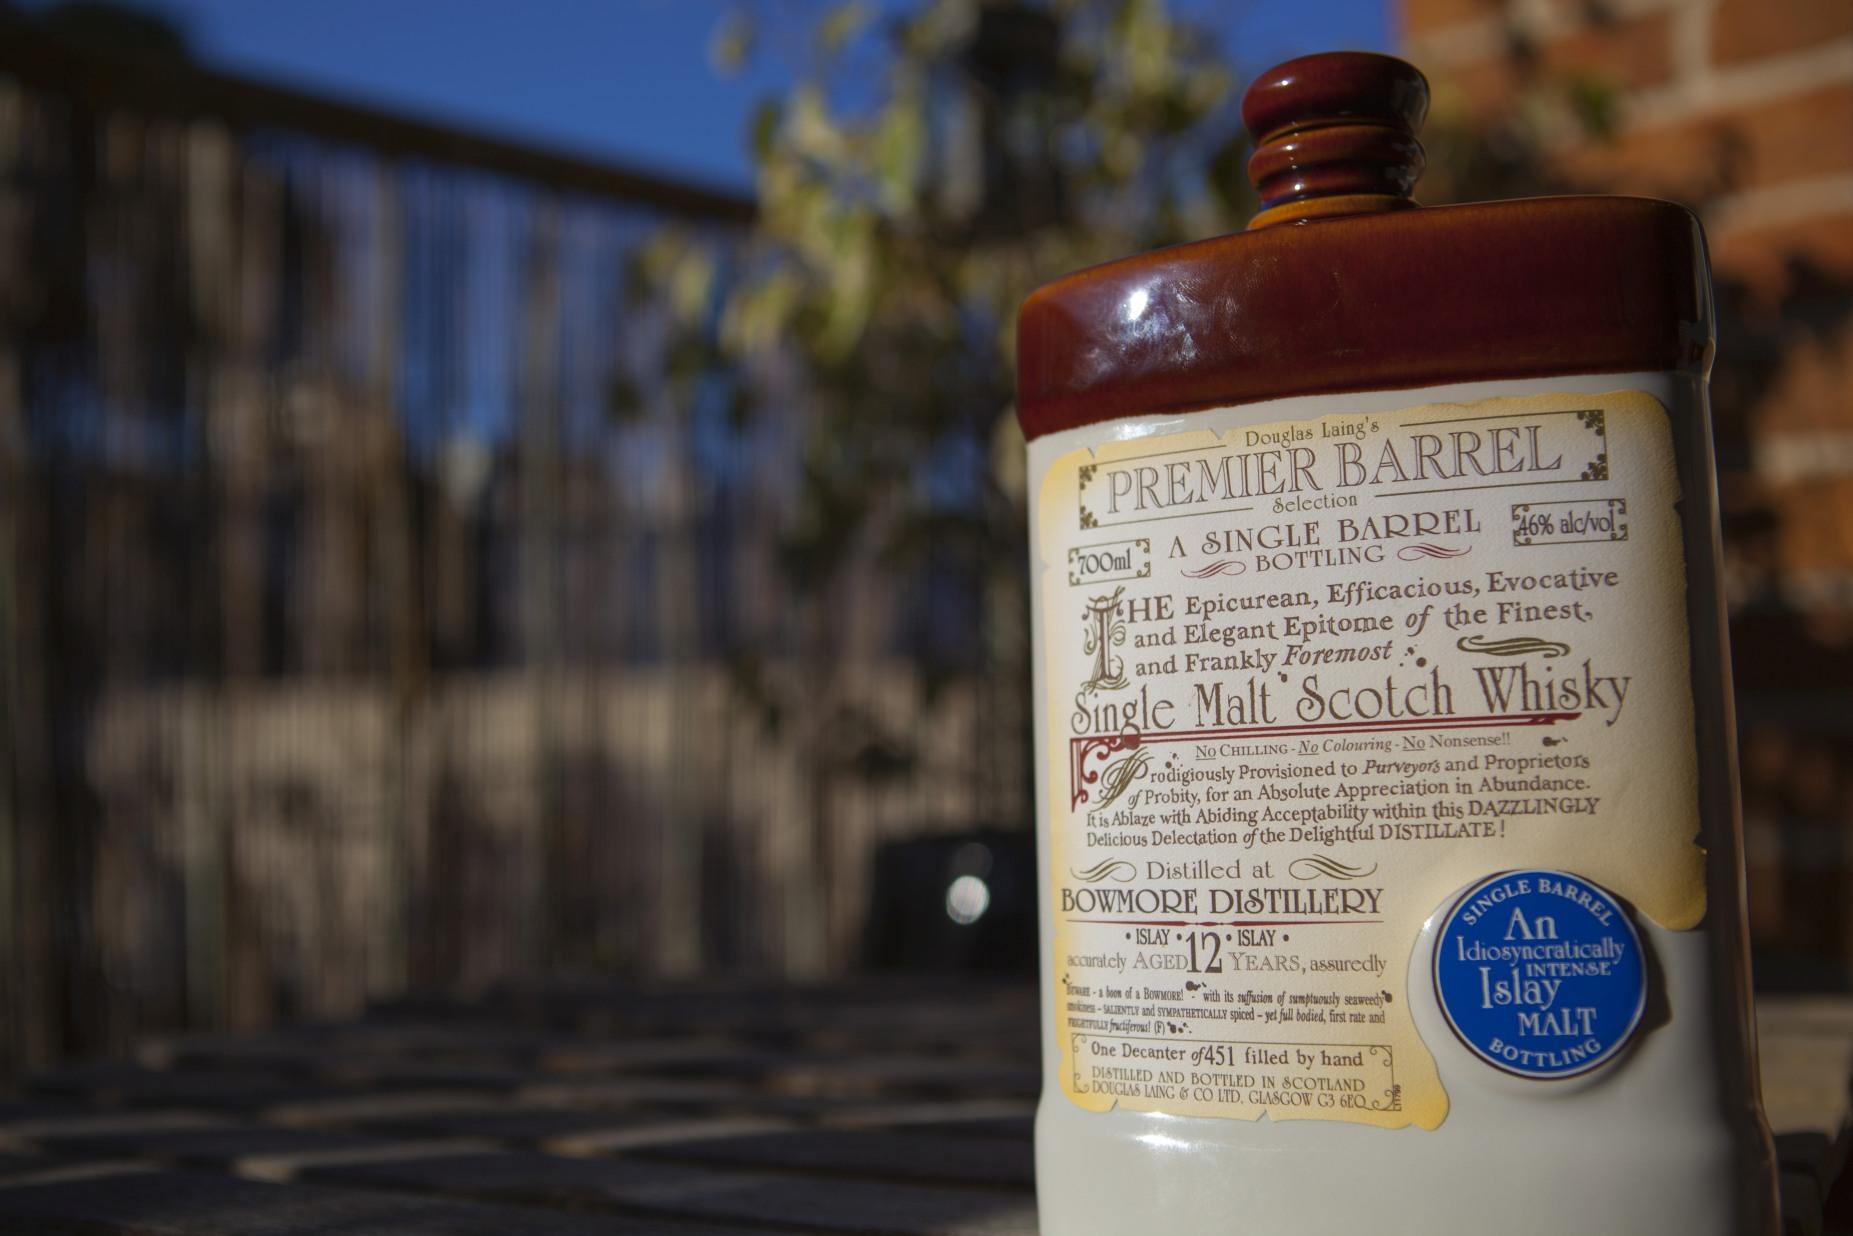 Douglas Laing Bowmore 12yr Premier Barrel Whisky Review